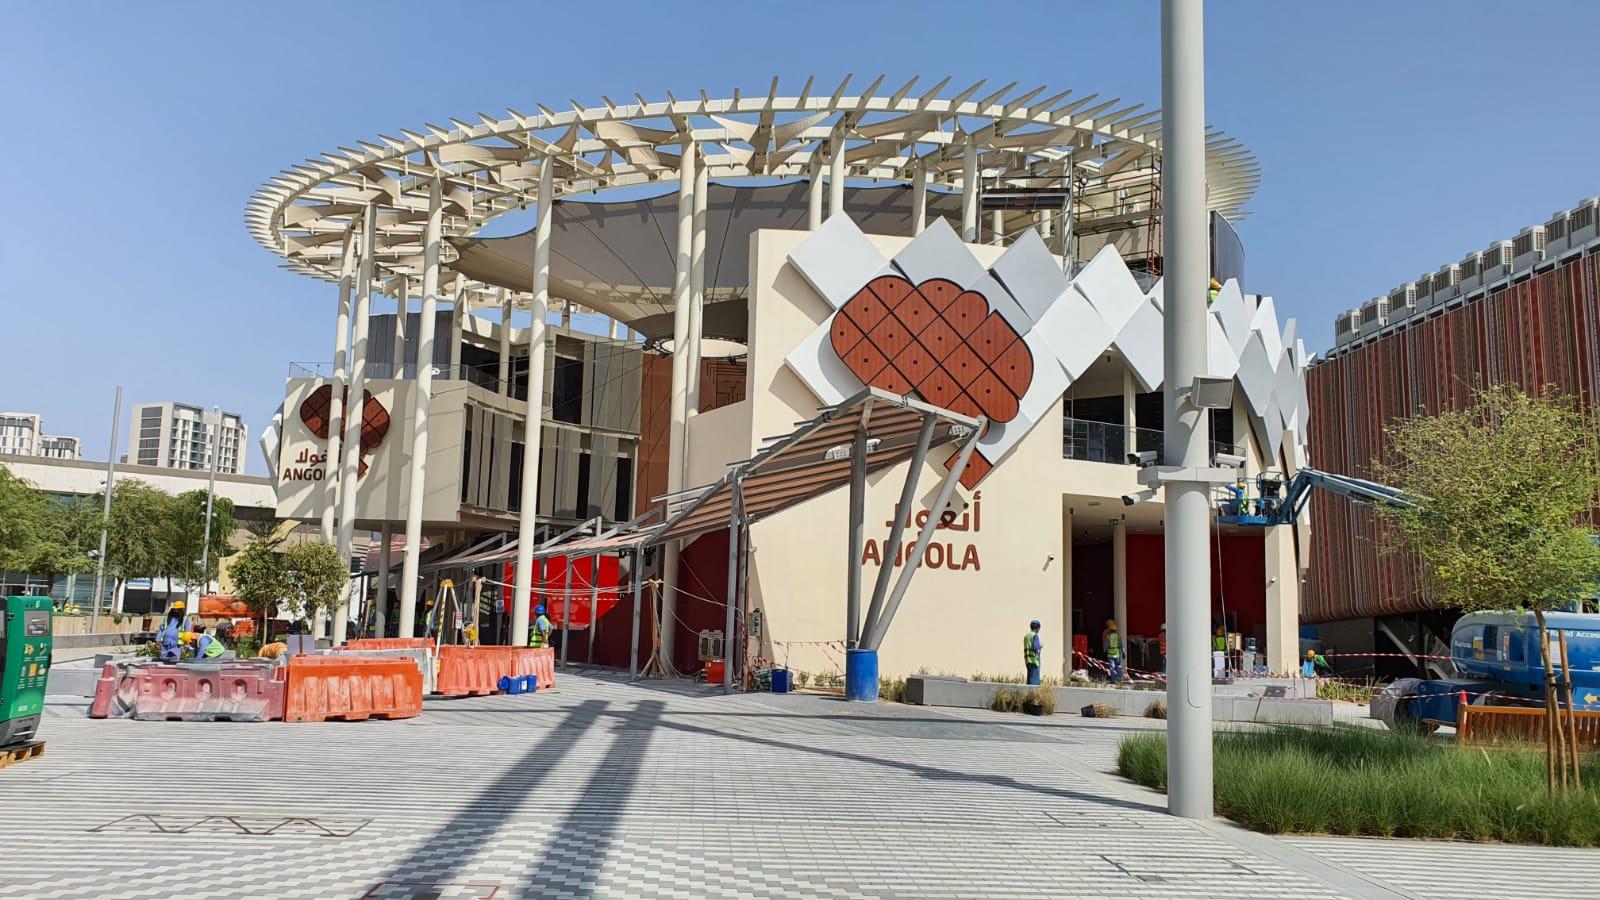 EXPO 2020 - Angola Pavilion - Dubai